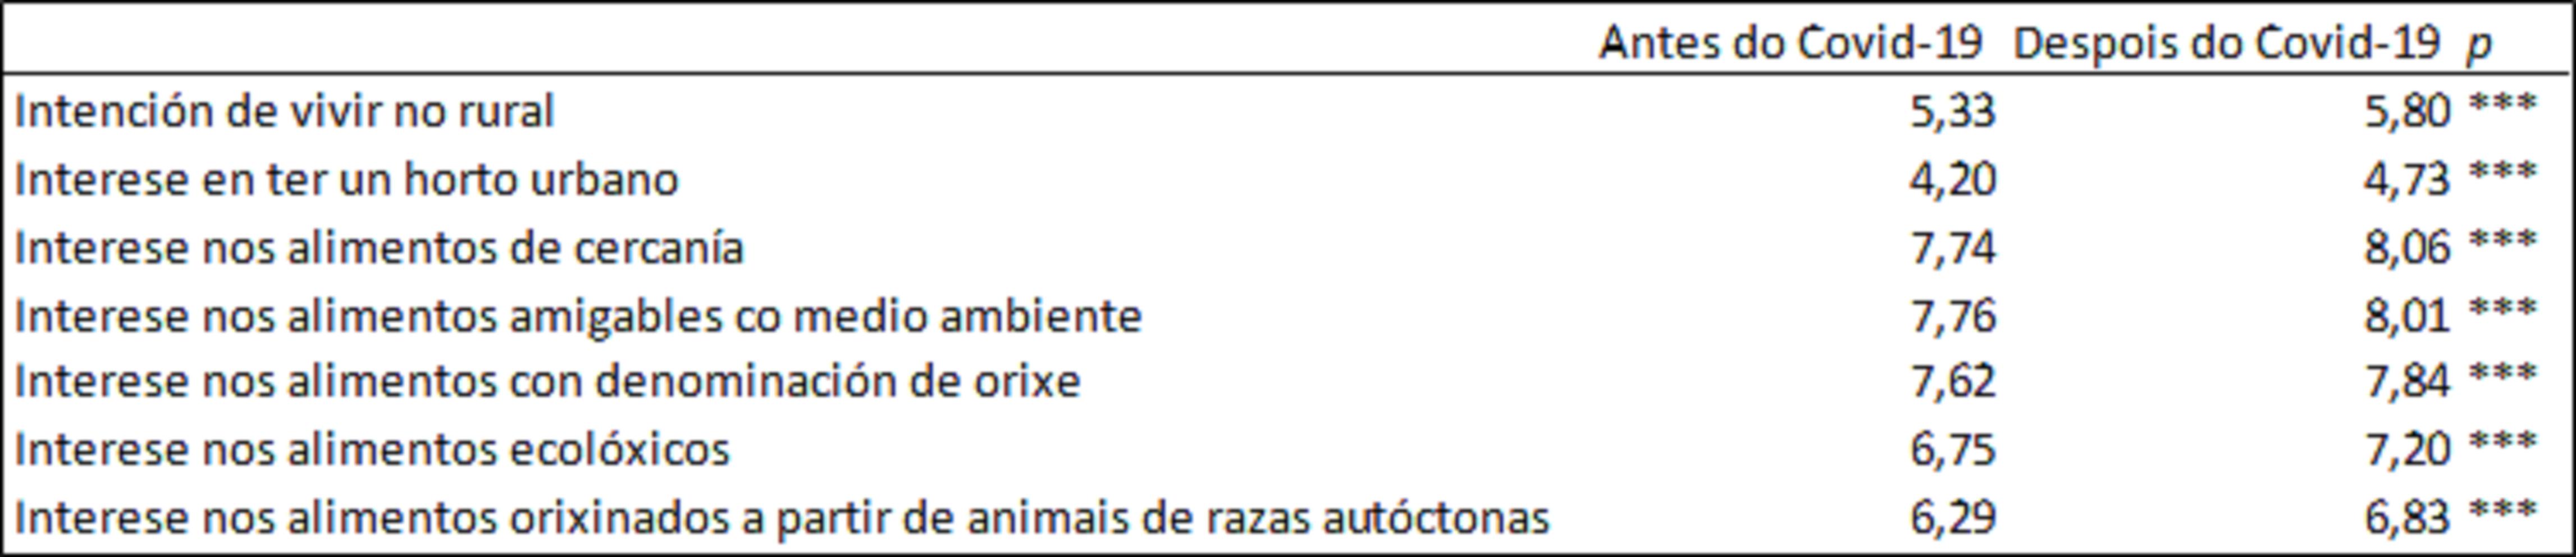 Táboa 1